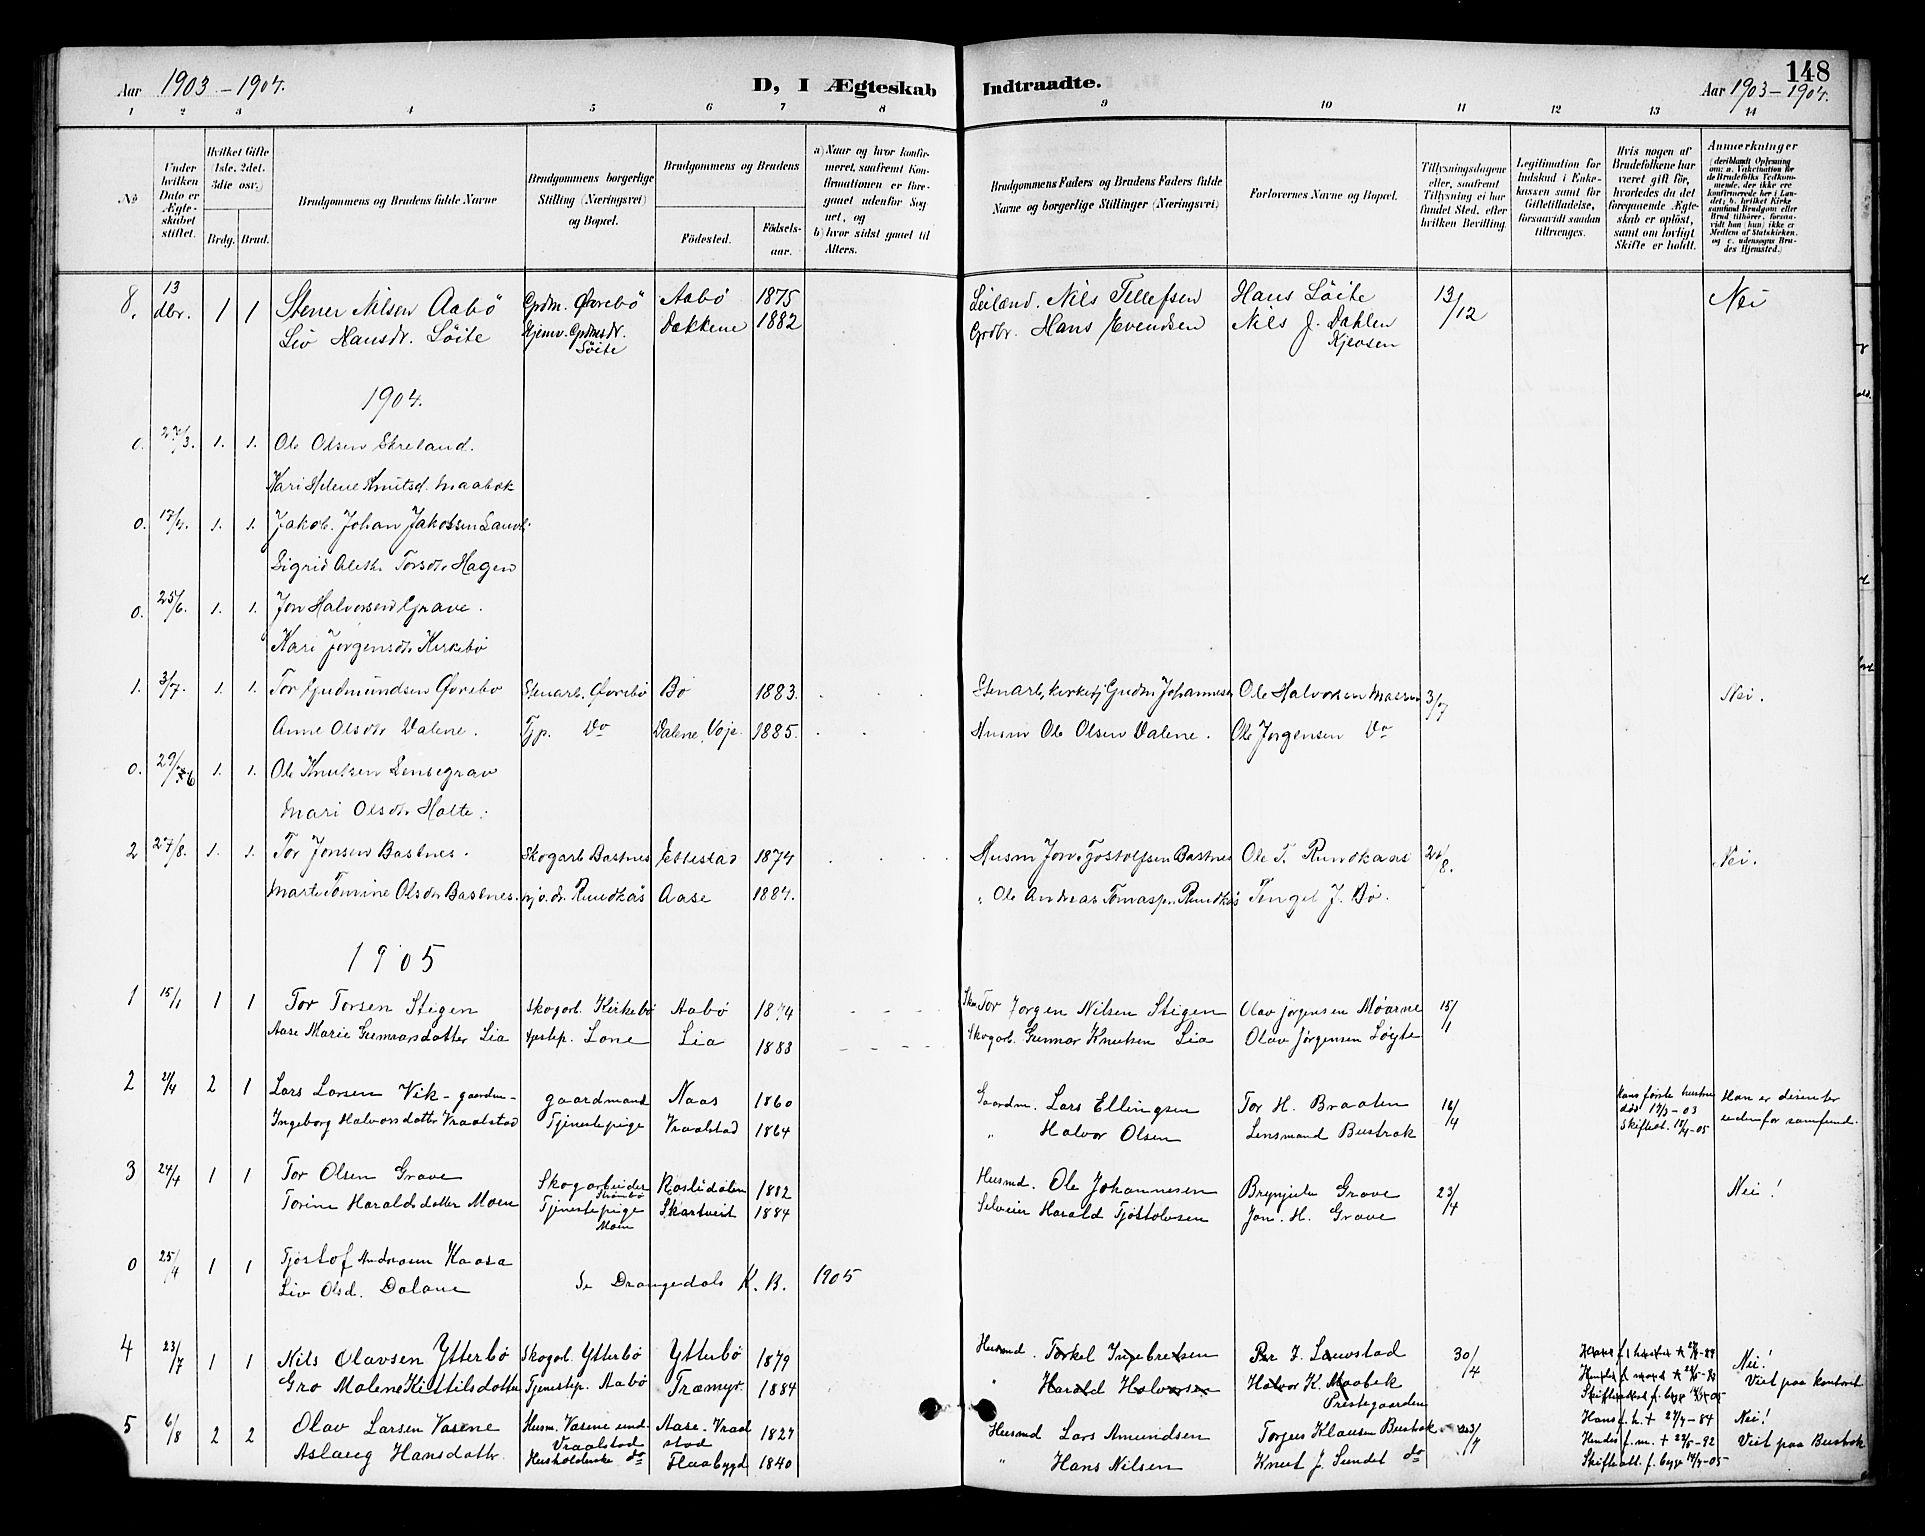 SAKO, Drangedal kirkebøker, G/Gb/L0002: Klokkerbok nr. II 2, 1895-1918, s. 148